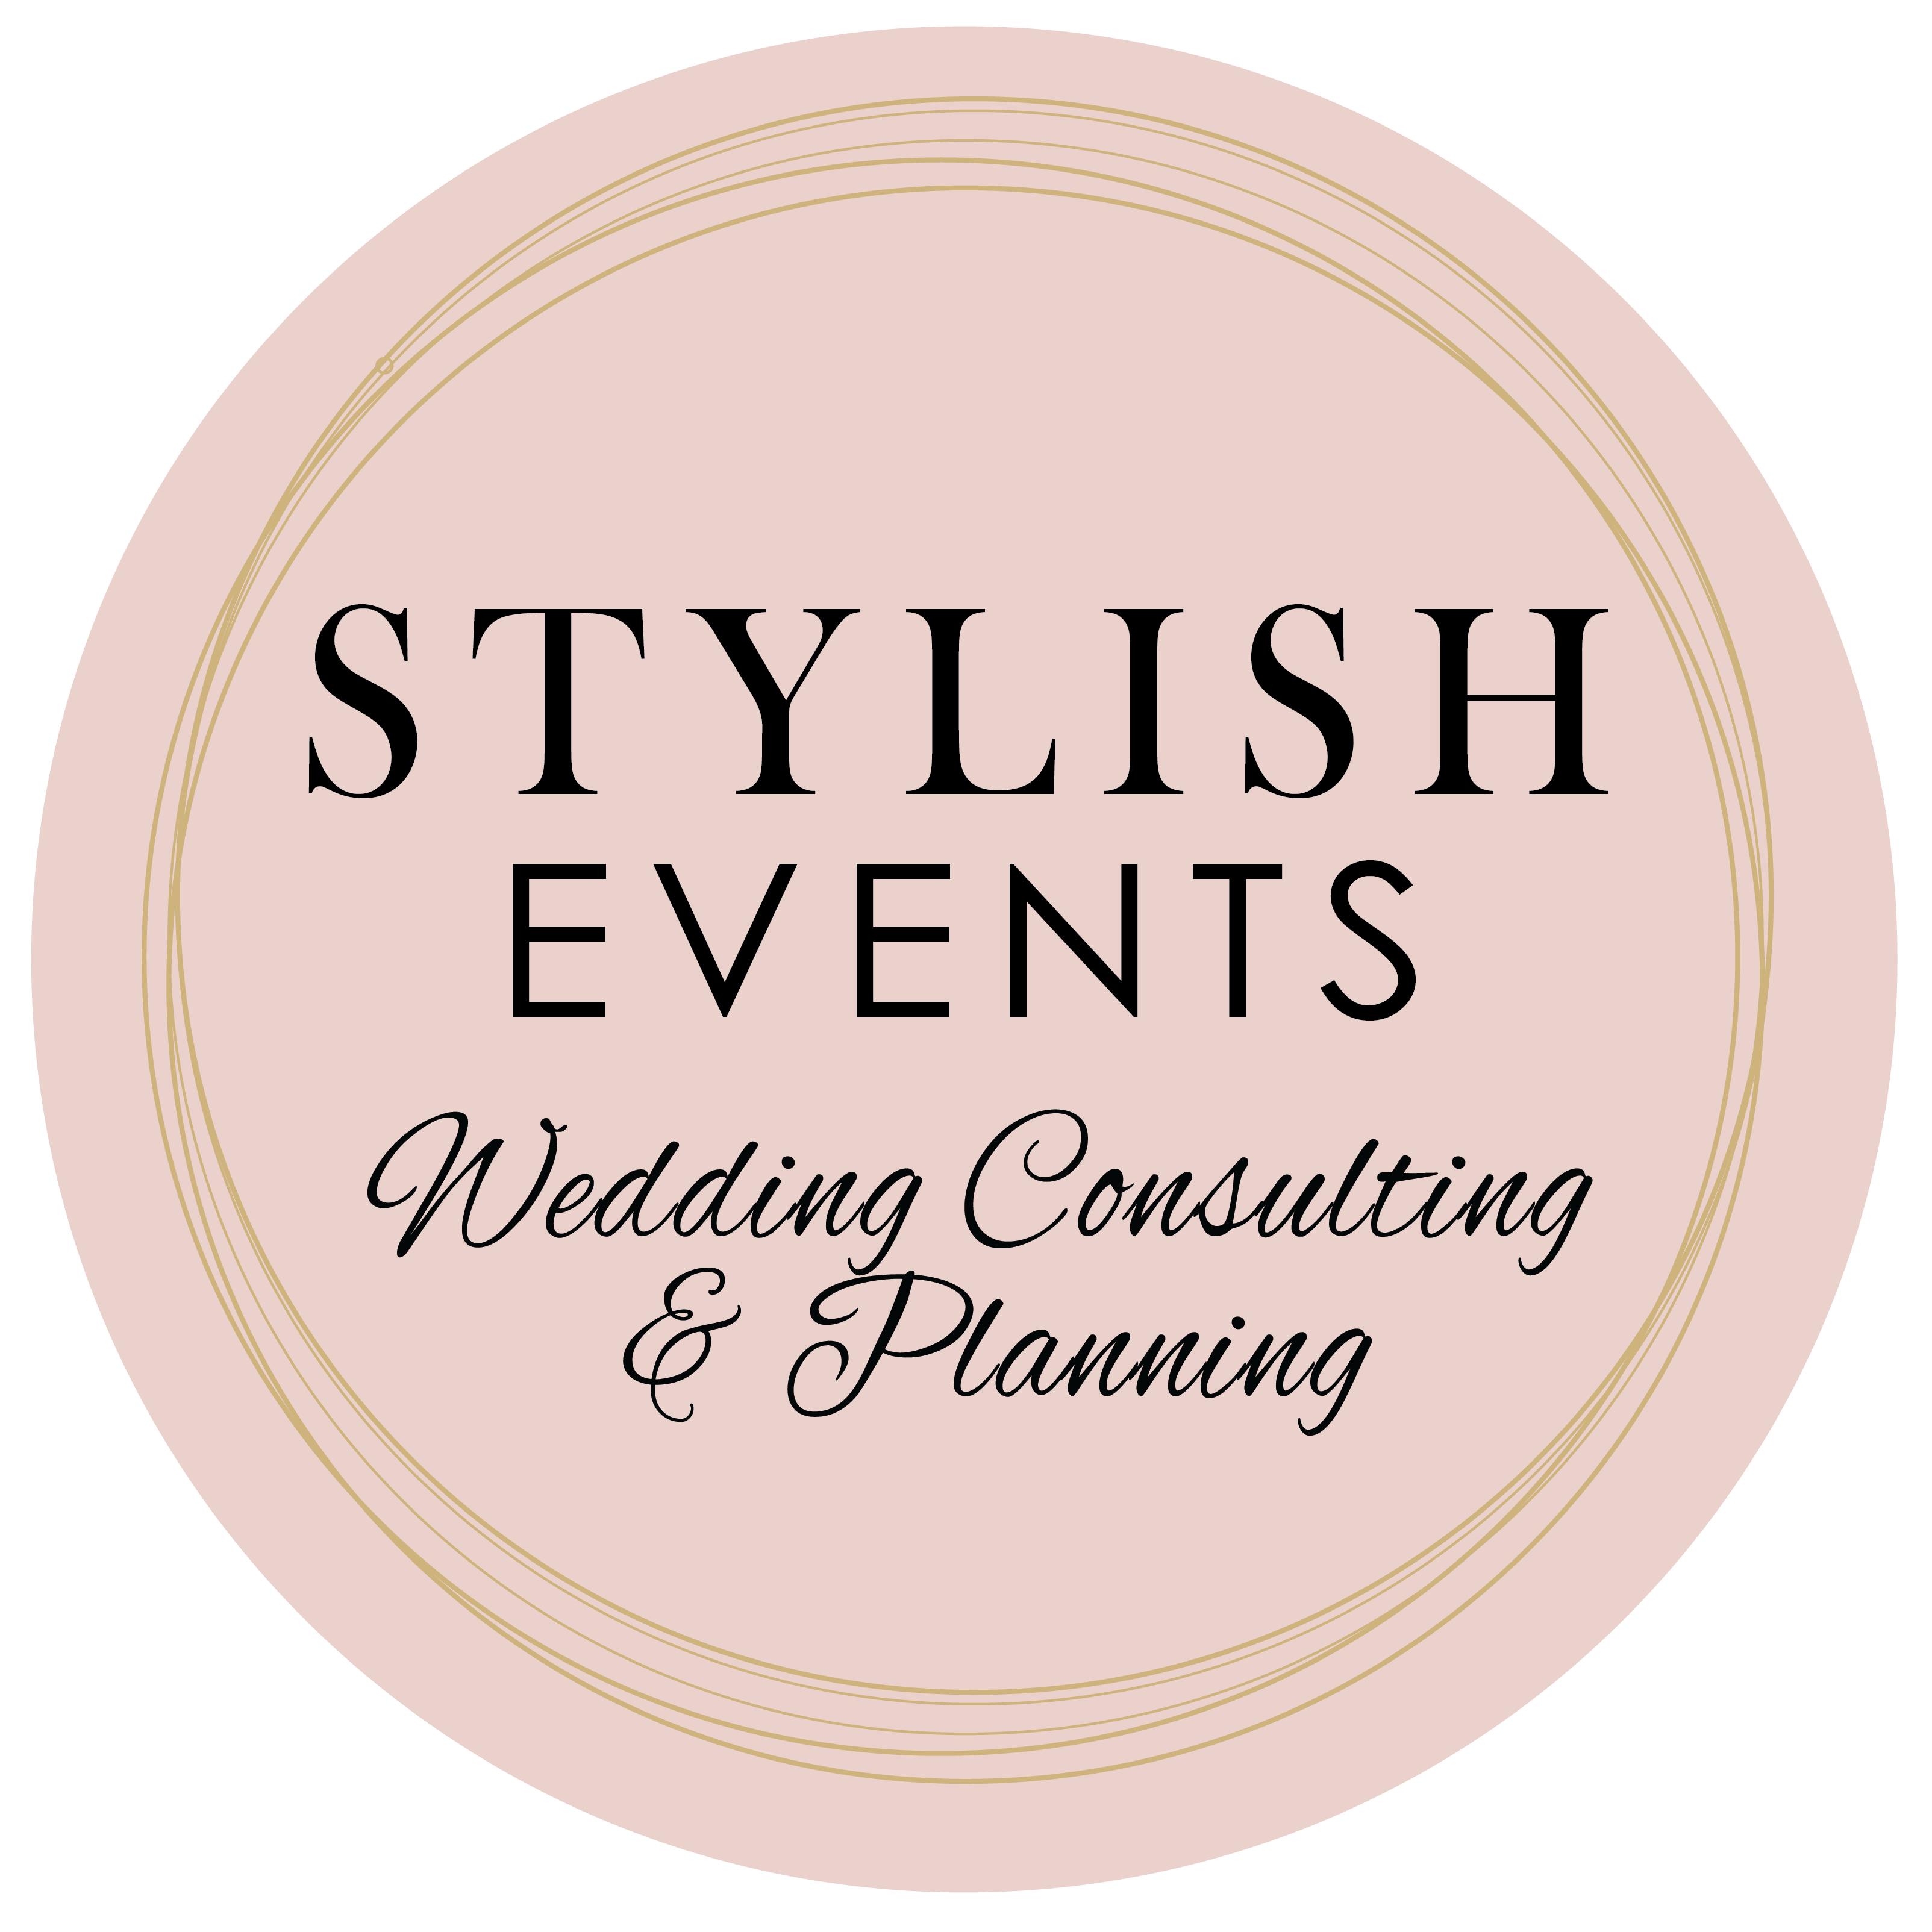 Stylish Events